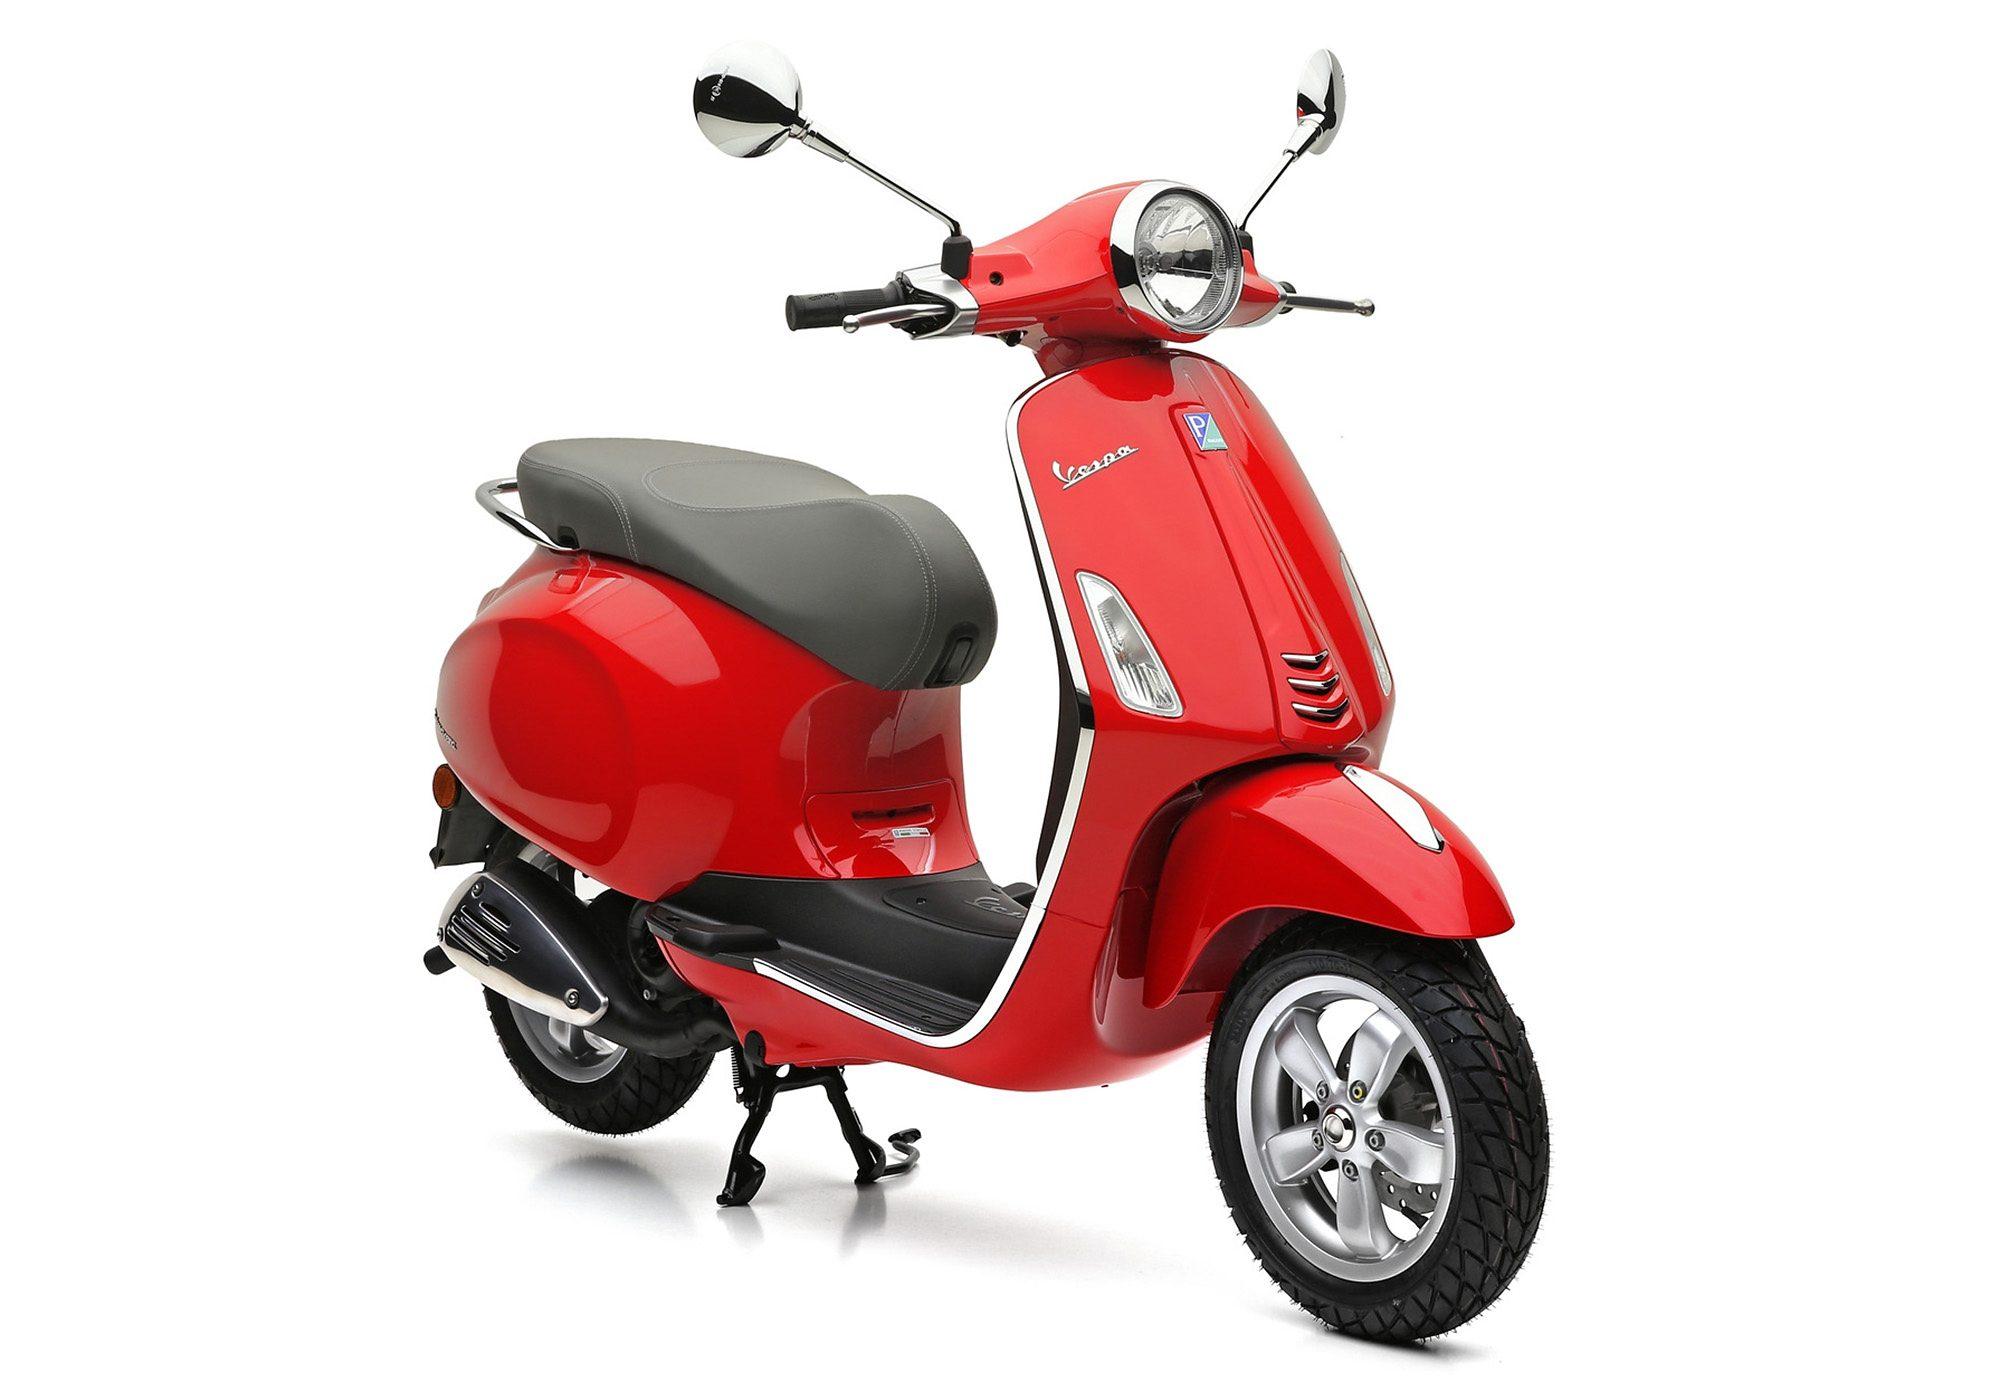 Motorroller, 49 ccm, 4,35 PS, 45 km/h, rot, »Primavera«, Vespa